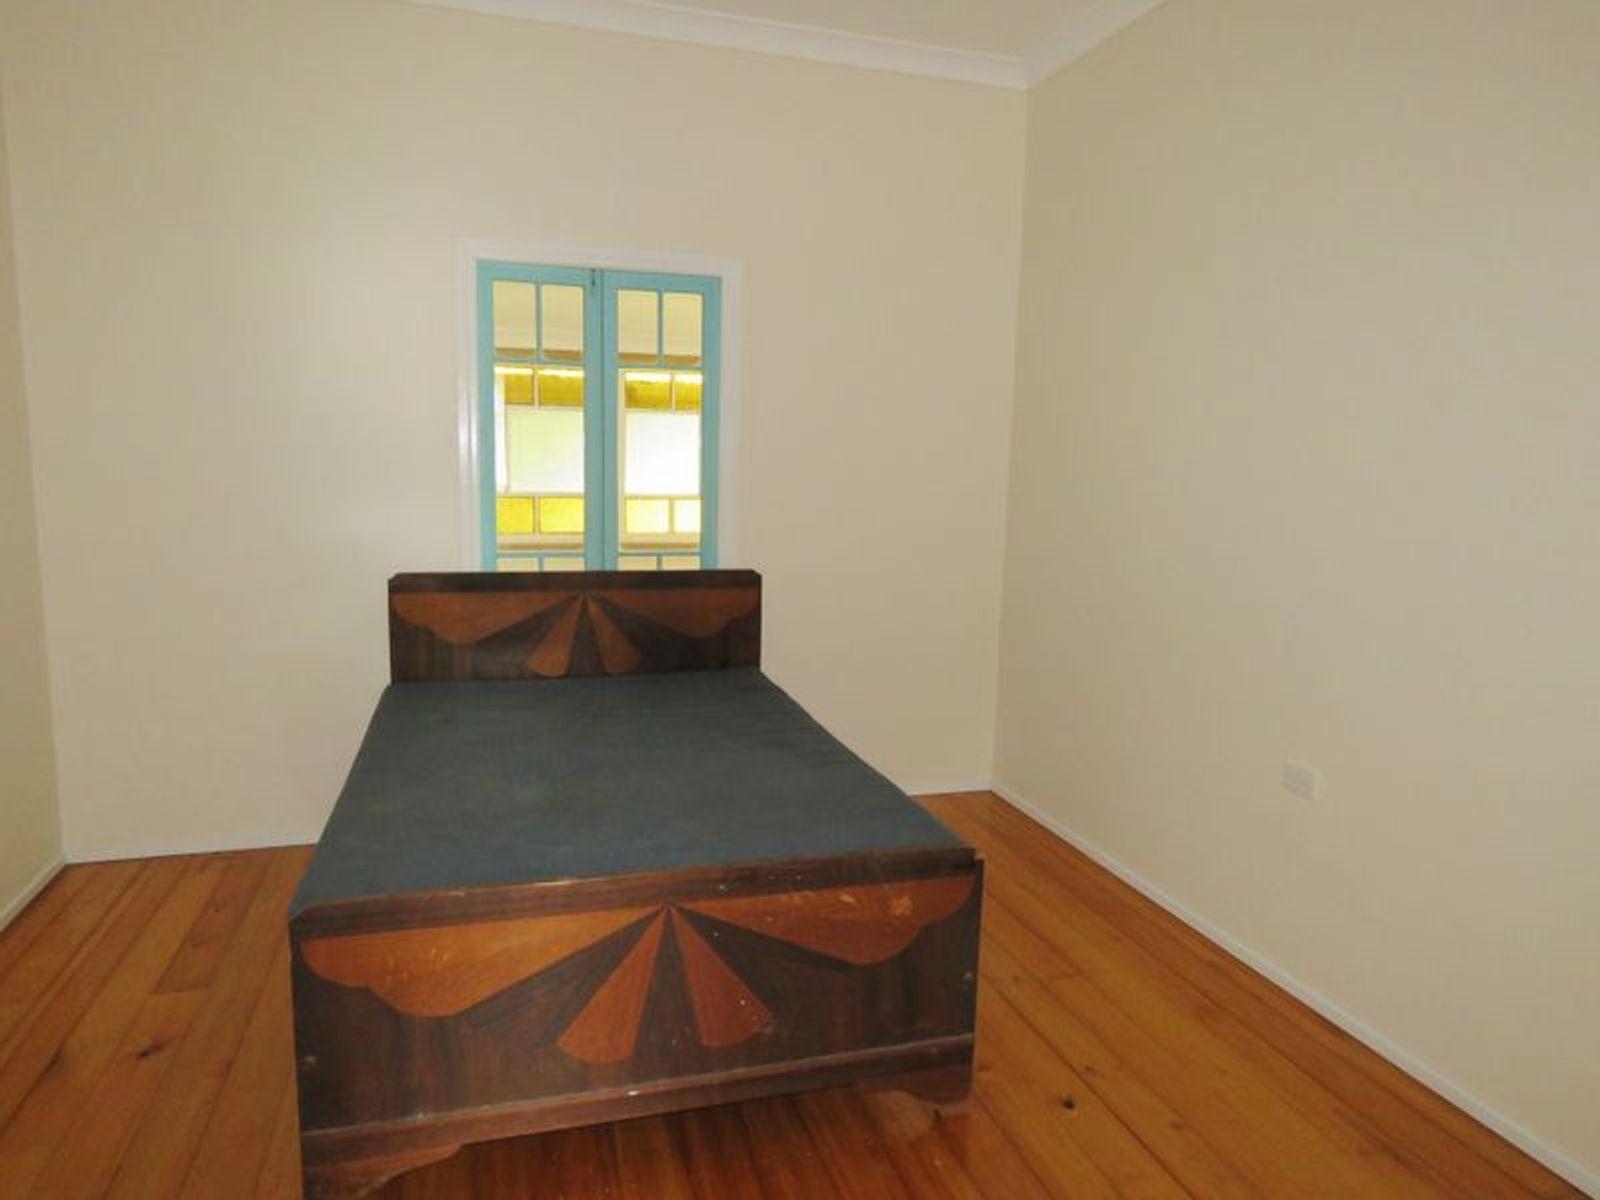 25 Macartney Street, St Lawrence, QLD 4707